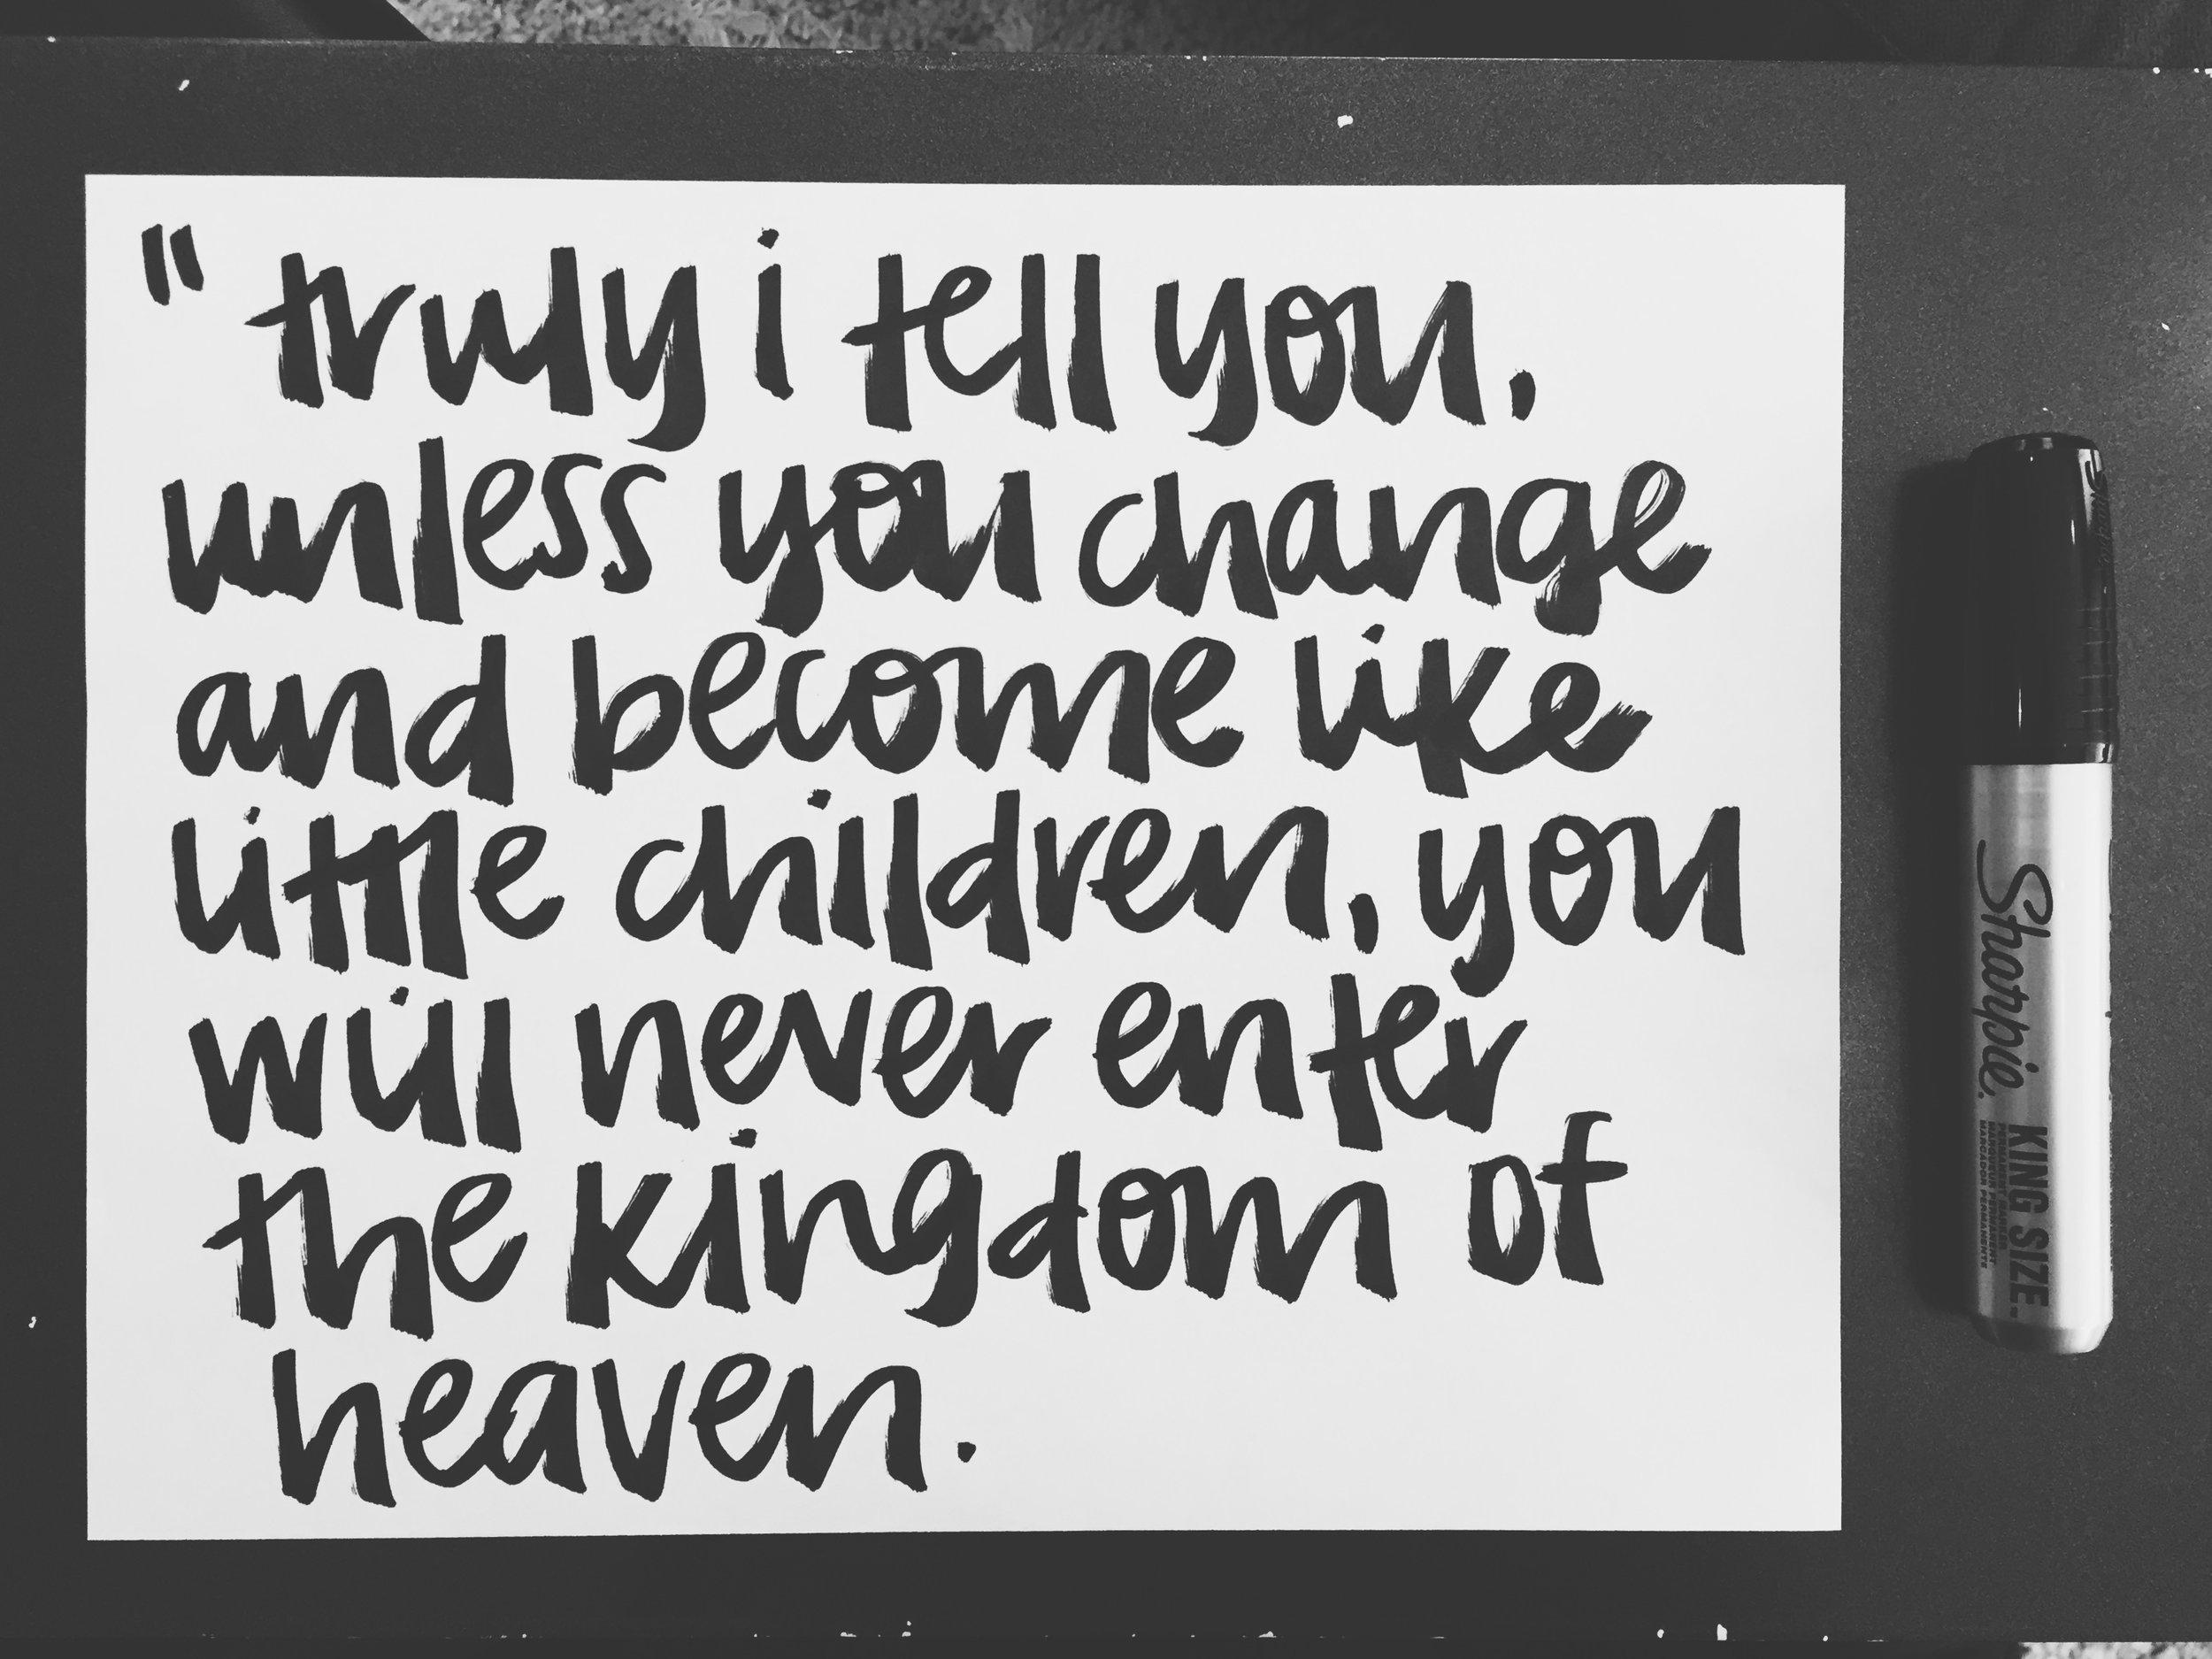 matthew 6:3